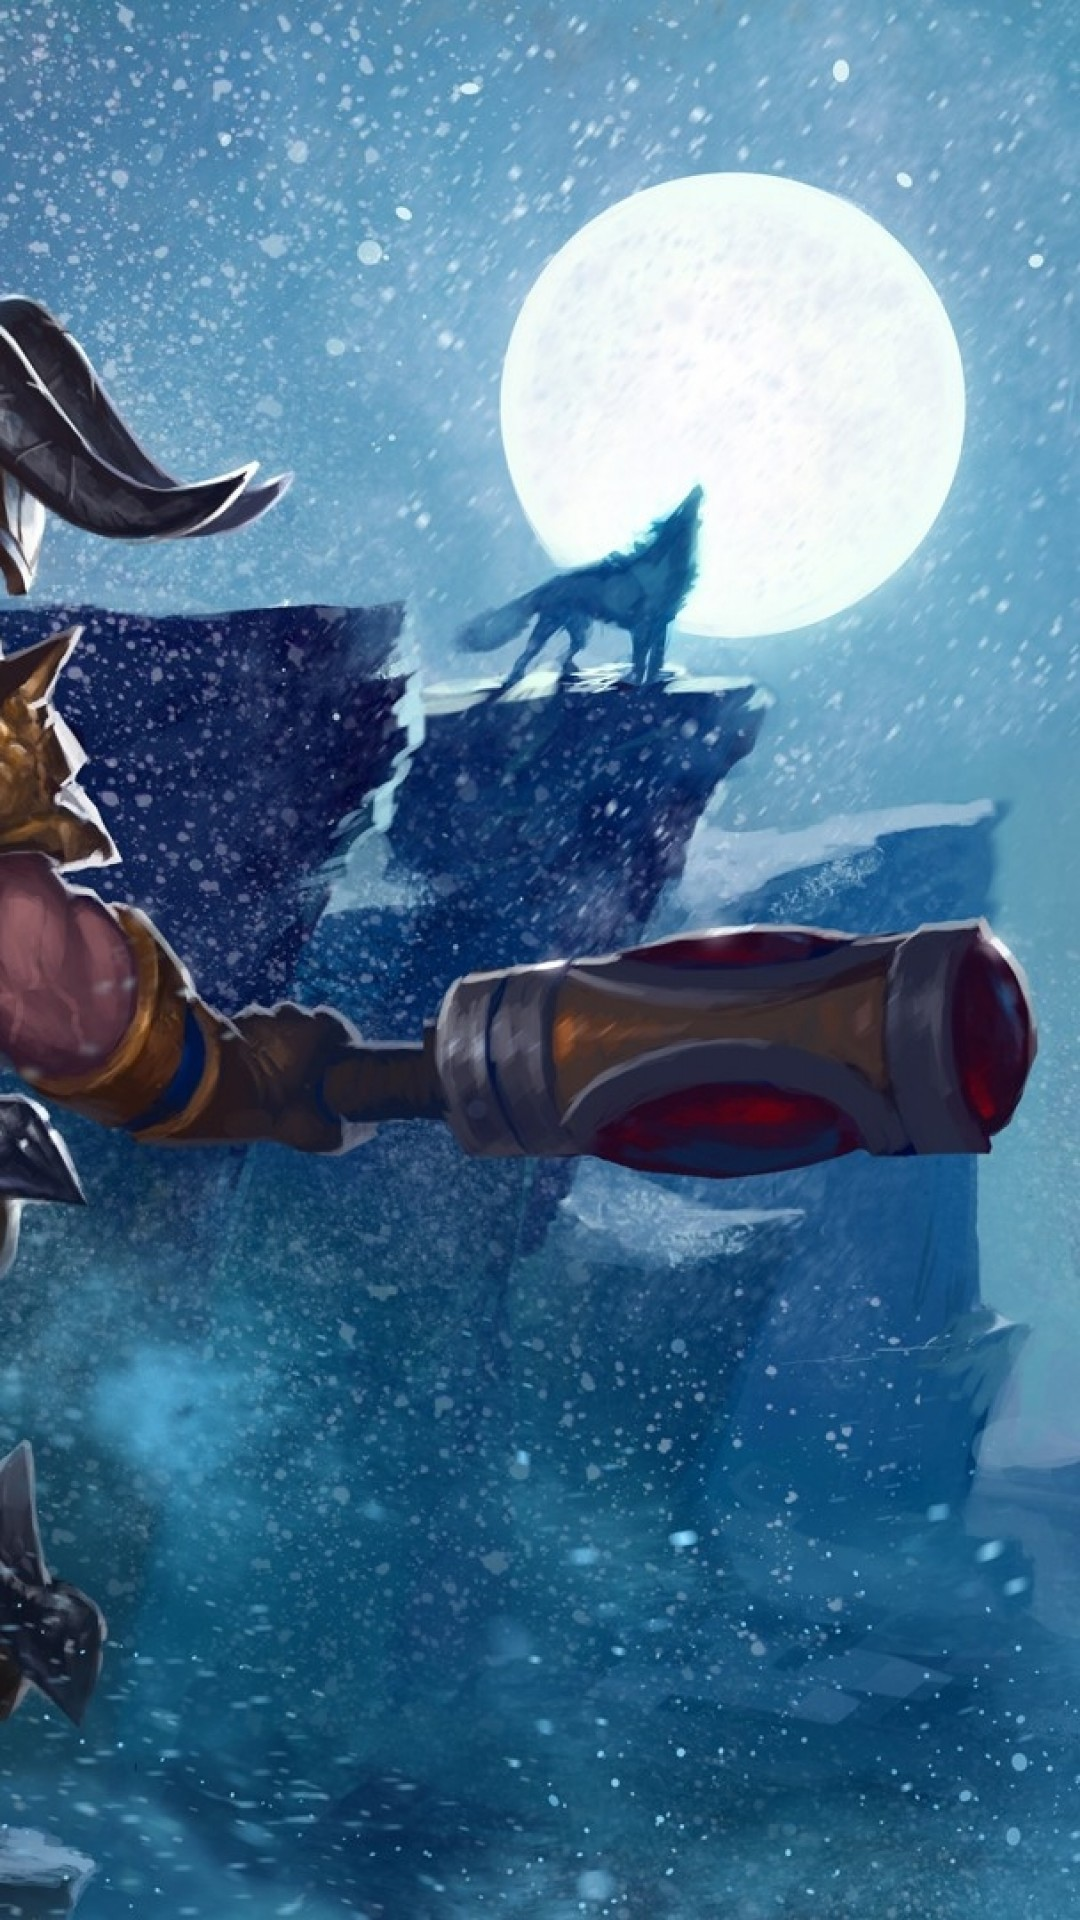 Heroes Of Newerth, Moon, Wolf